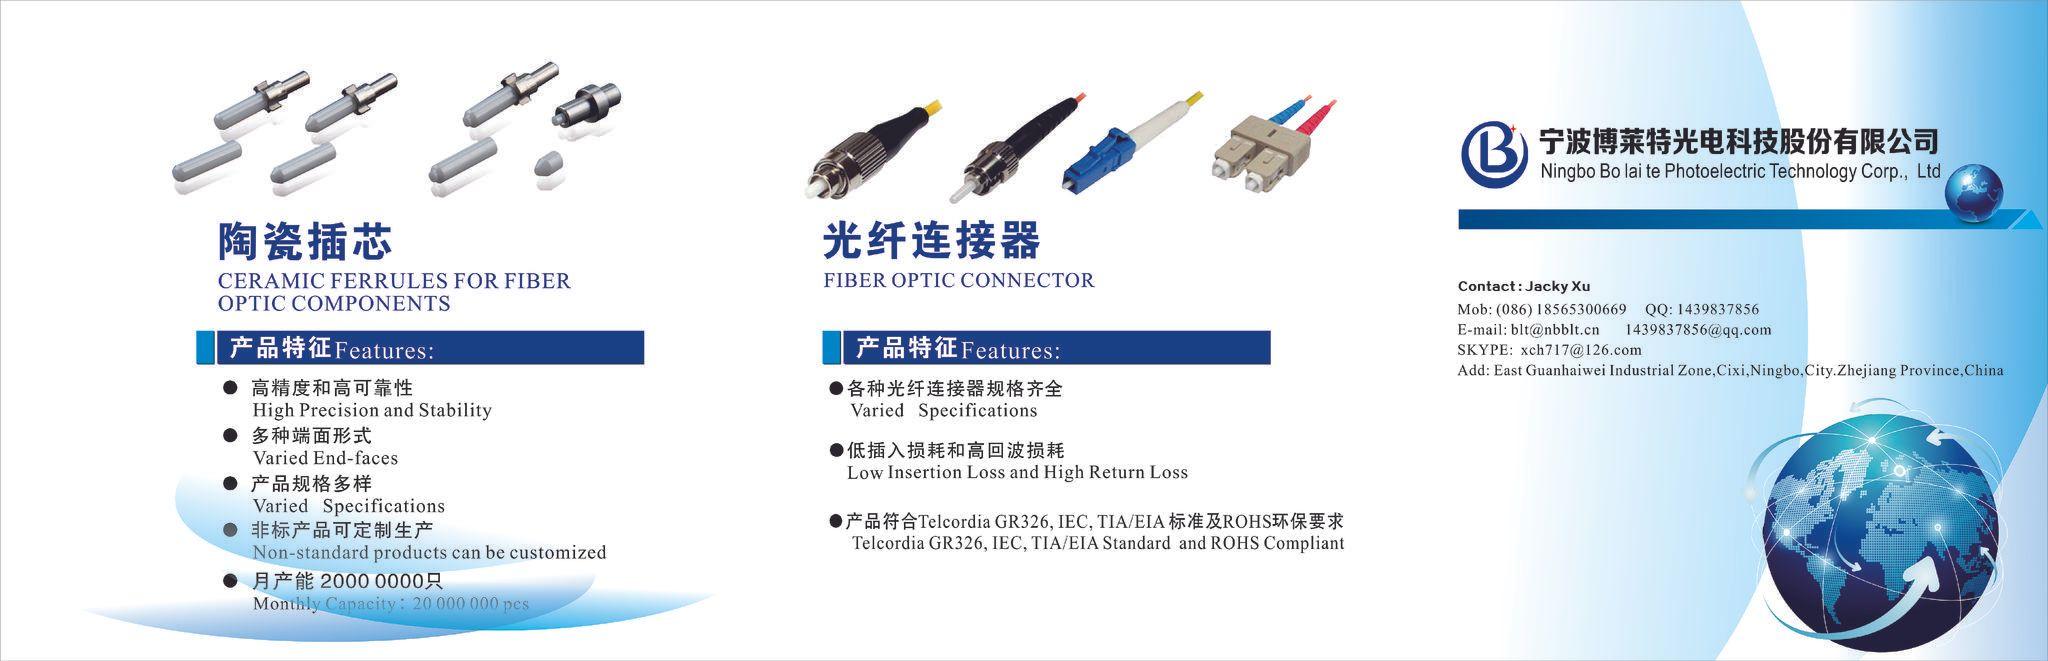 Ningbo Bo Lai Te Potoelectric Technology Corp., Ltd.